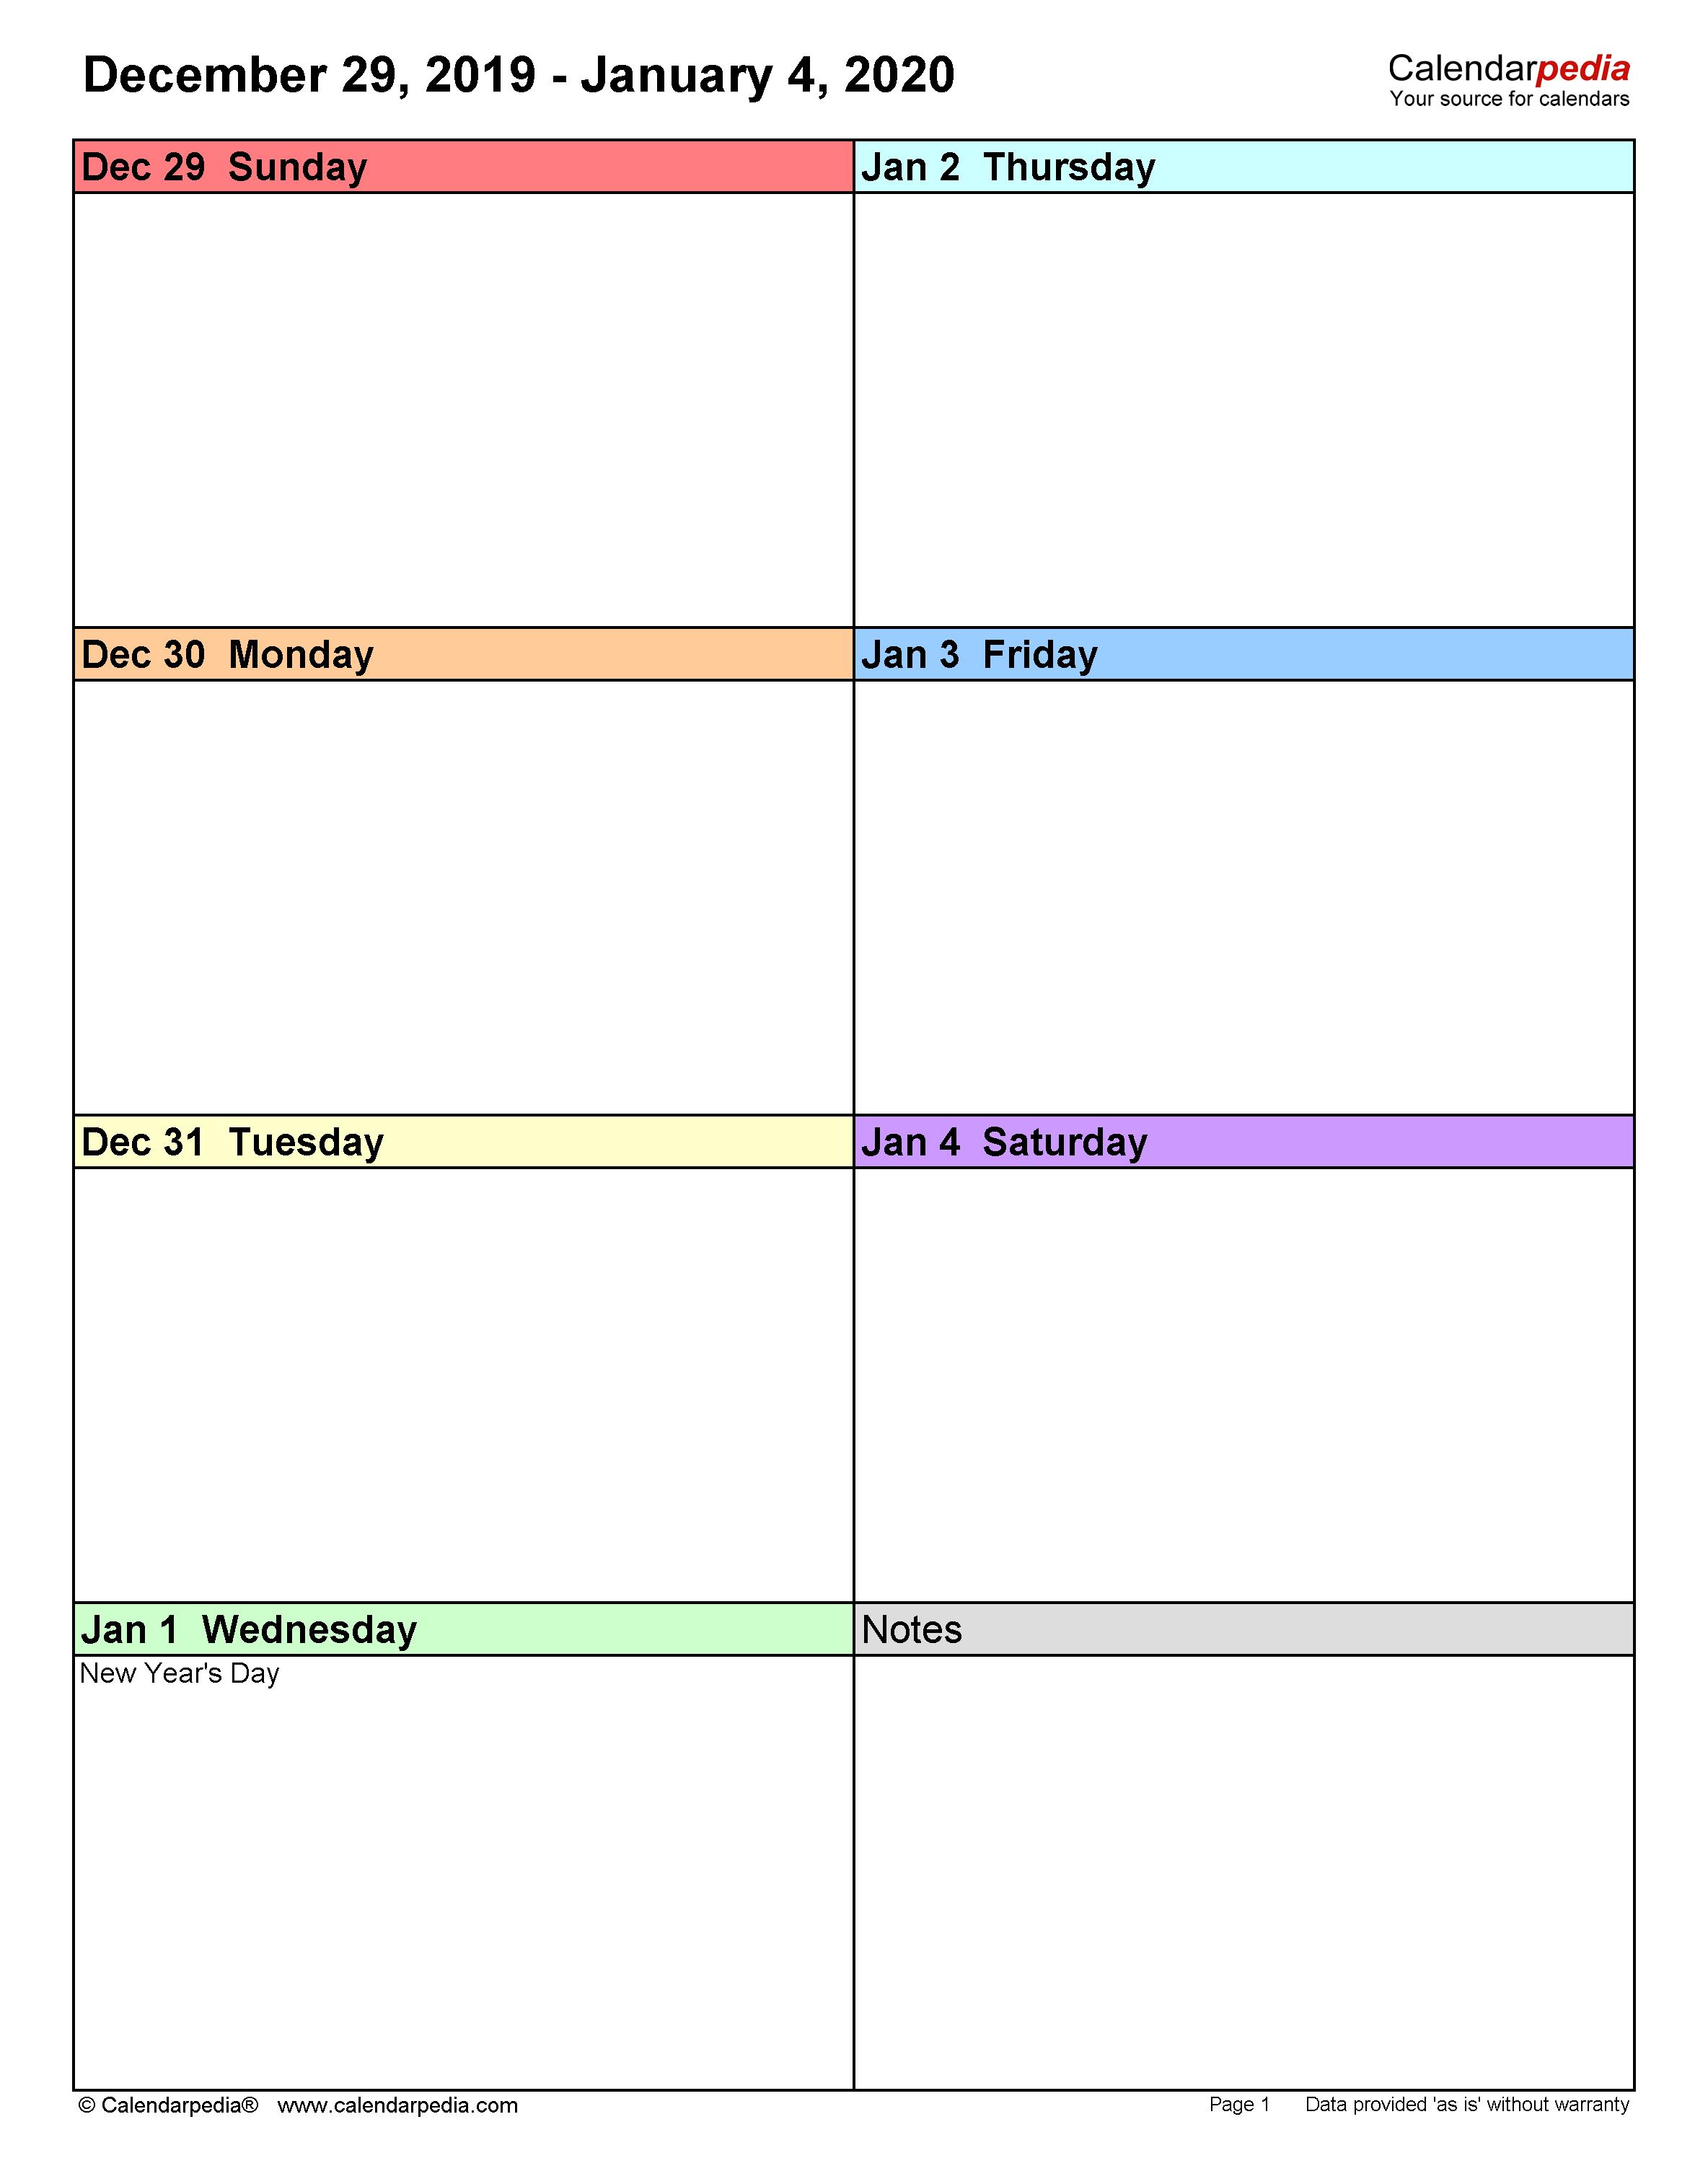 Weekly Calendars 2020 For Excel - 12 Free Printable Templates regarding Calendar 2020 Sat Thru Sunday